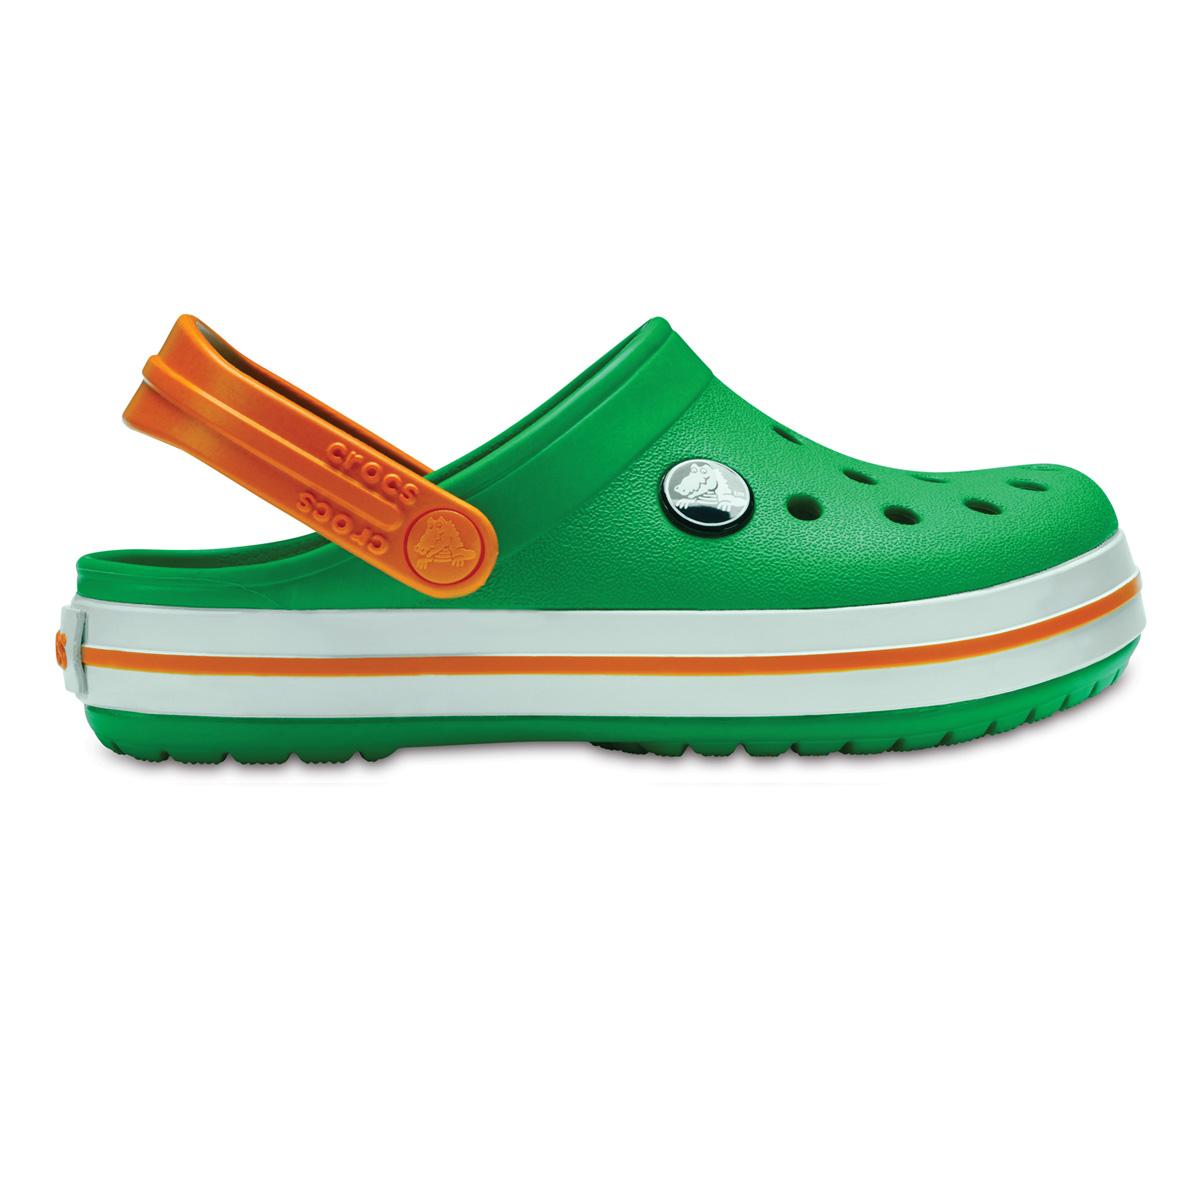 Crocs Crocband Clog K - Çimen Yeşili/Beyaz/Turuncu